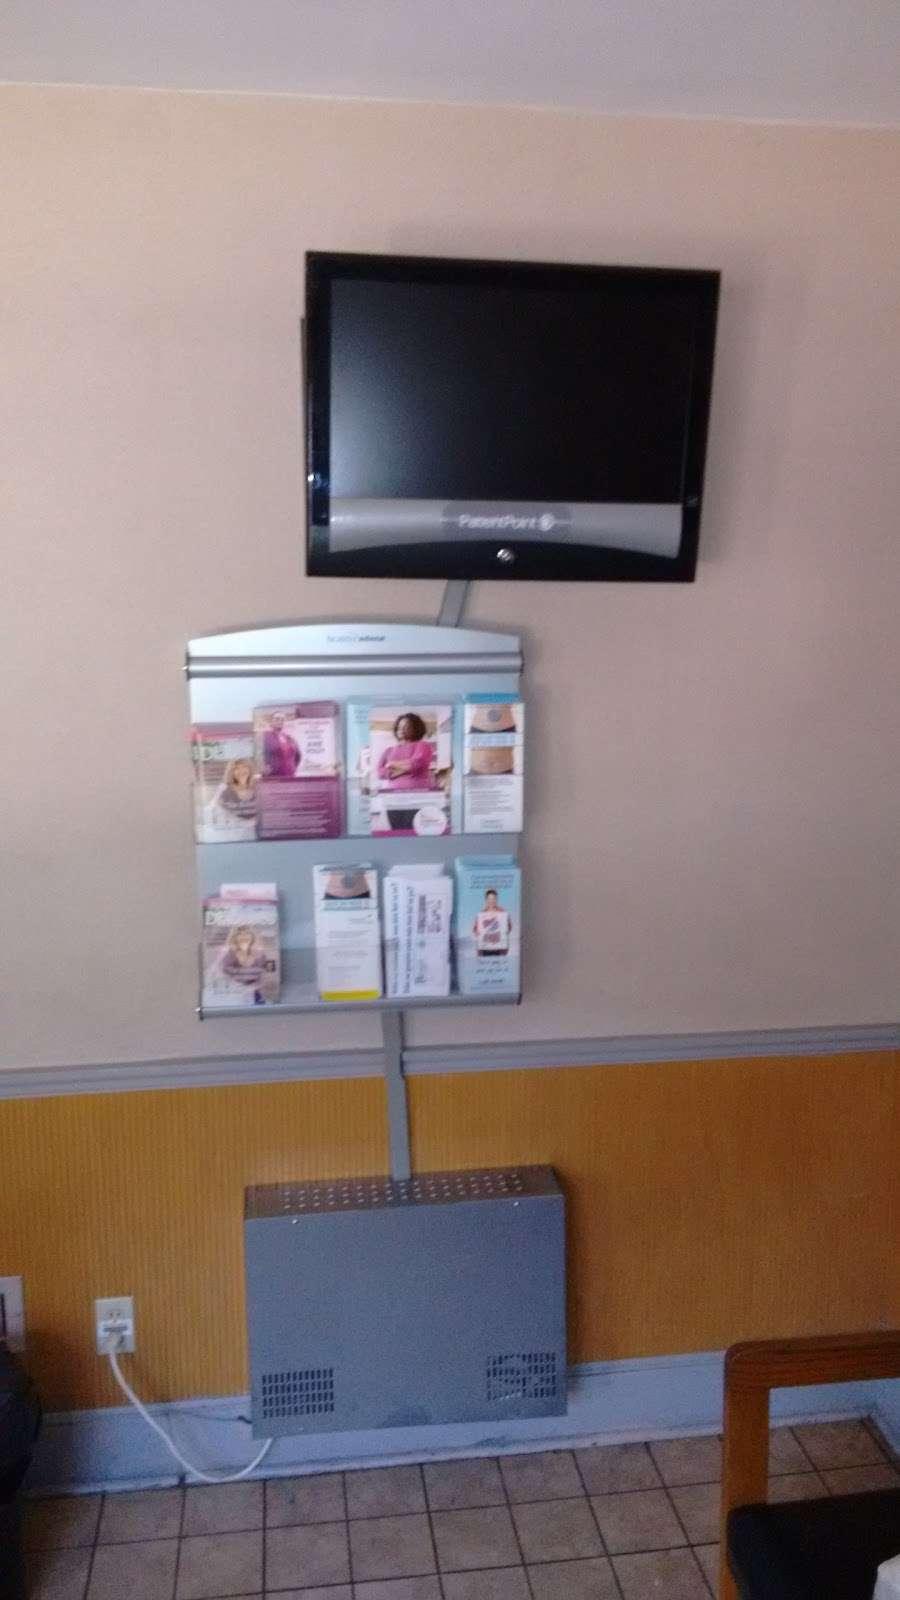 Ocean Family Care Center - health  | Photo 2 of 2 | Address: 622 Ocean Ave, Brooklyn, NY 11226, USA | Phone: (718) 693-2800